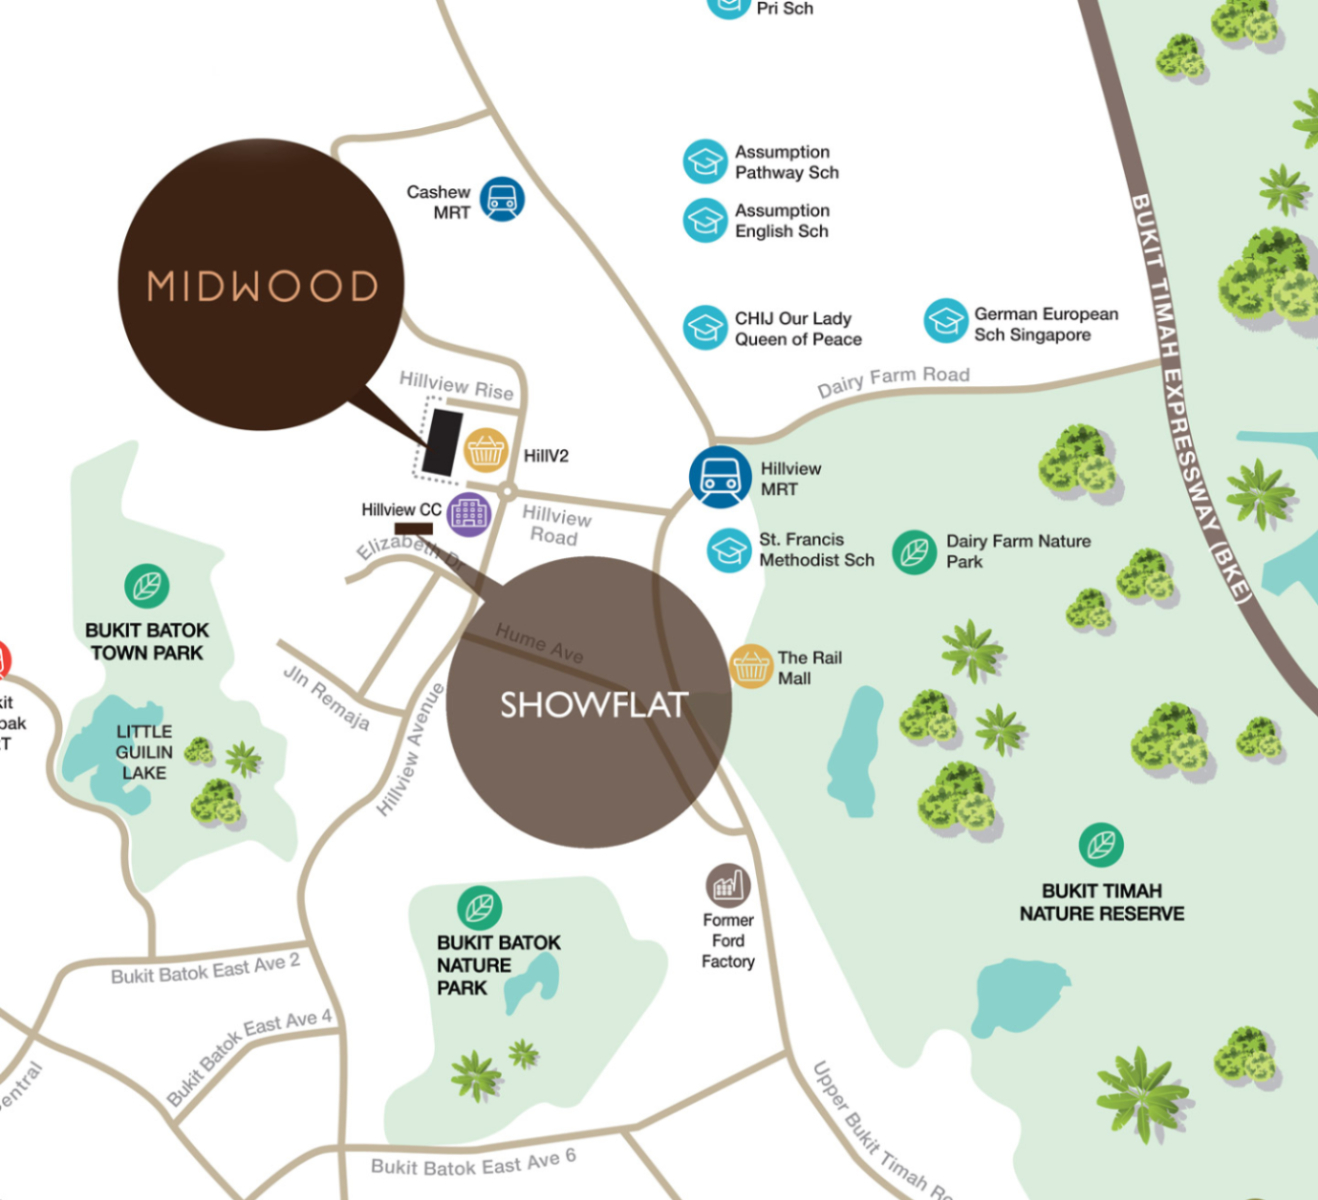 midwood 667971 sglp80970543